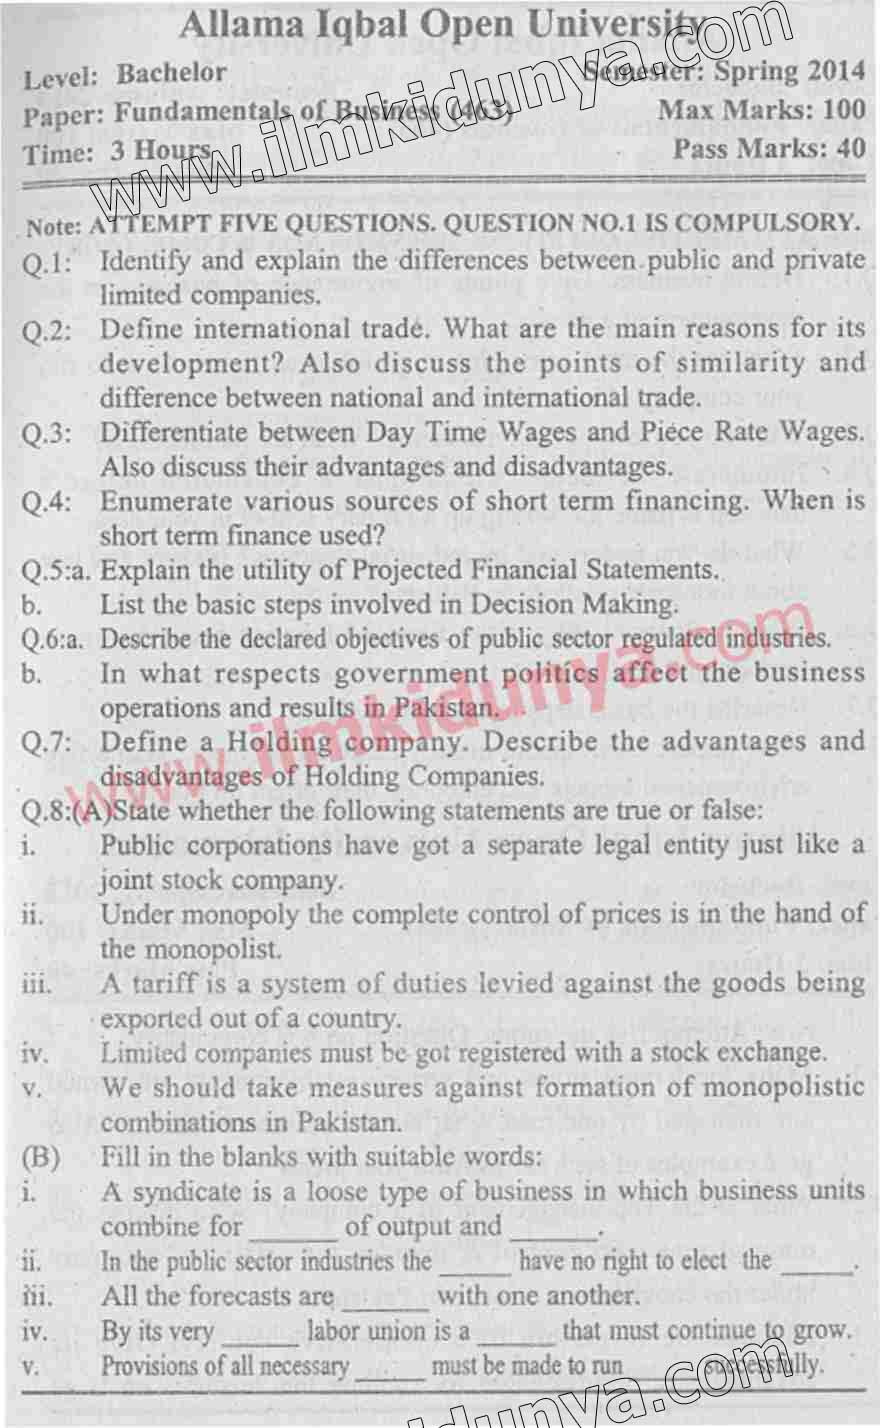 Past Papers 2014 Allama Iqbal Open University BCom